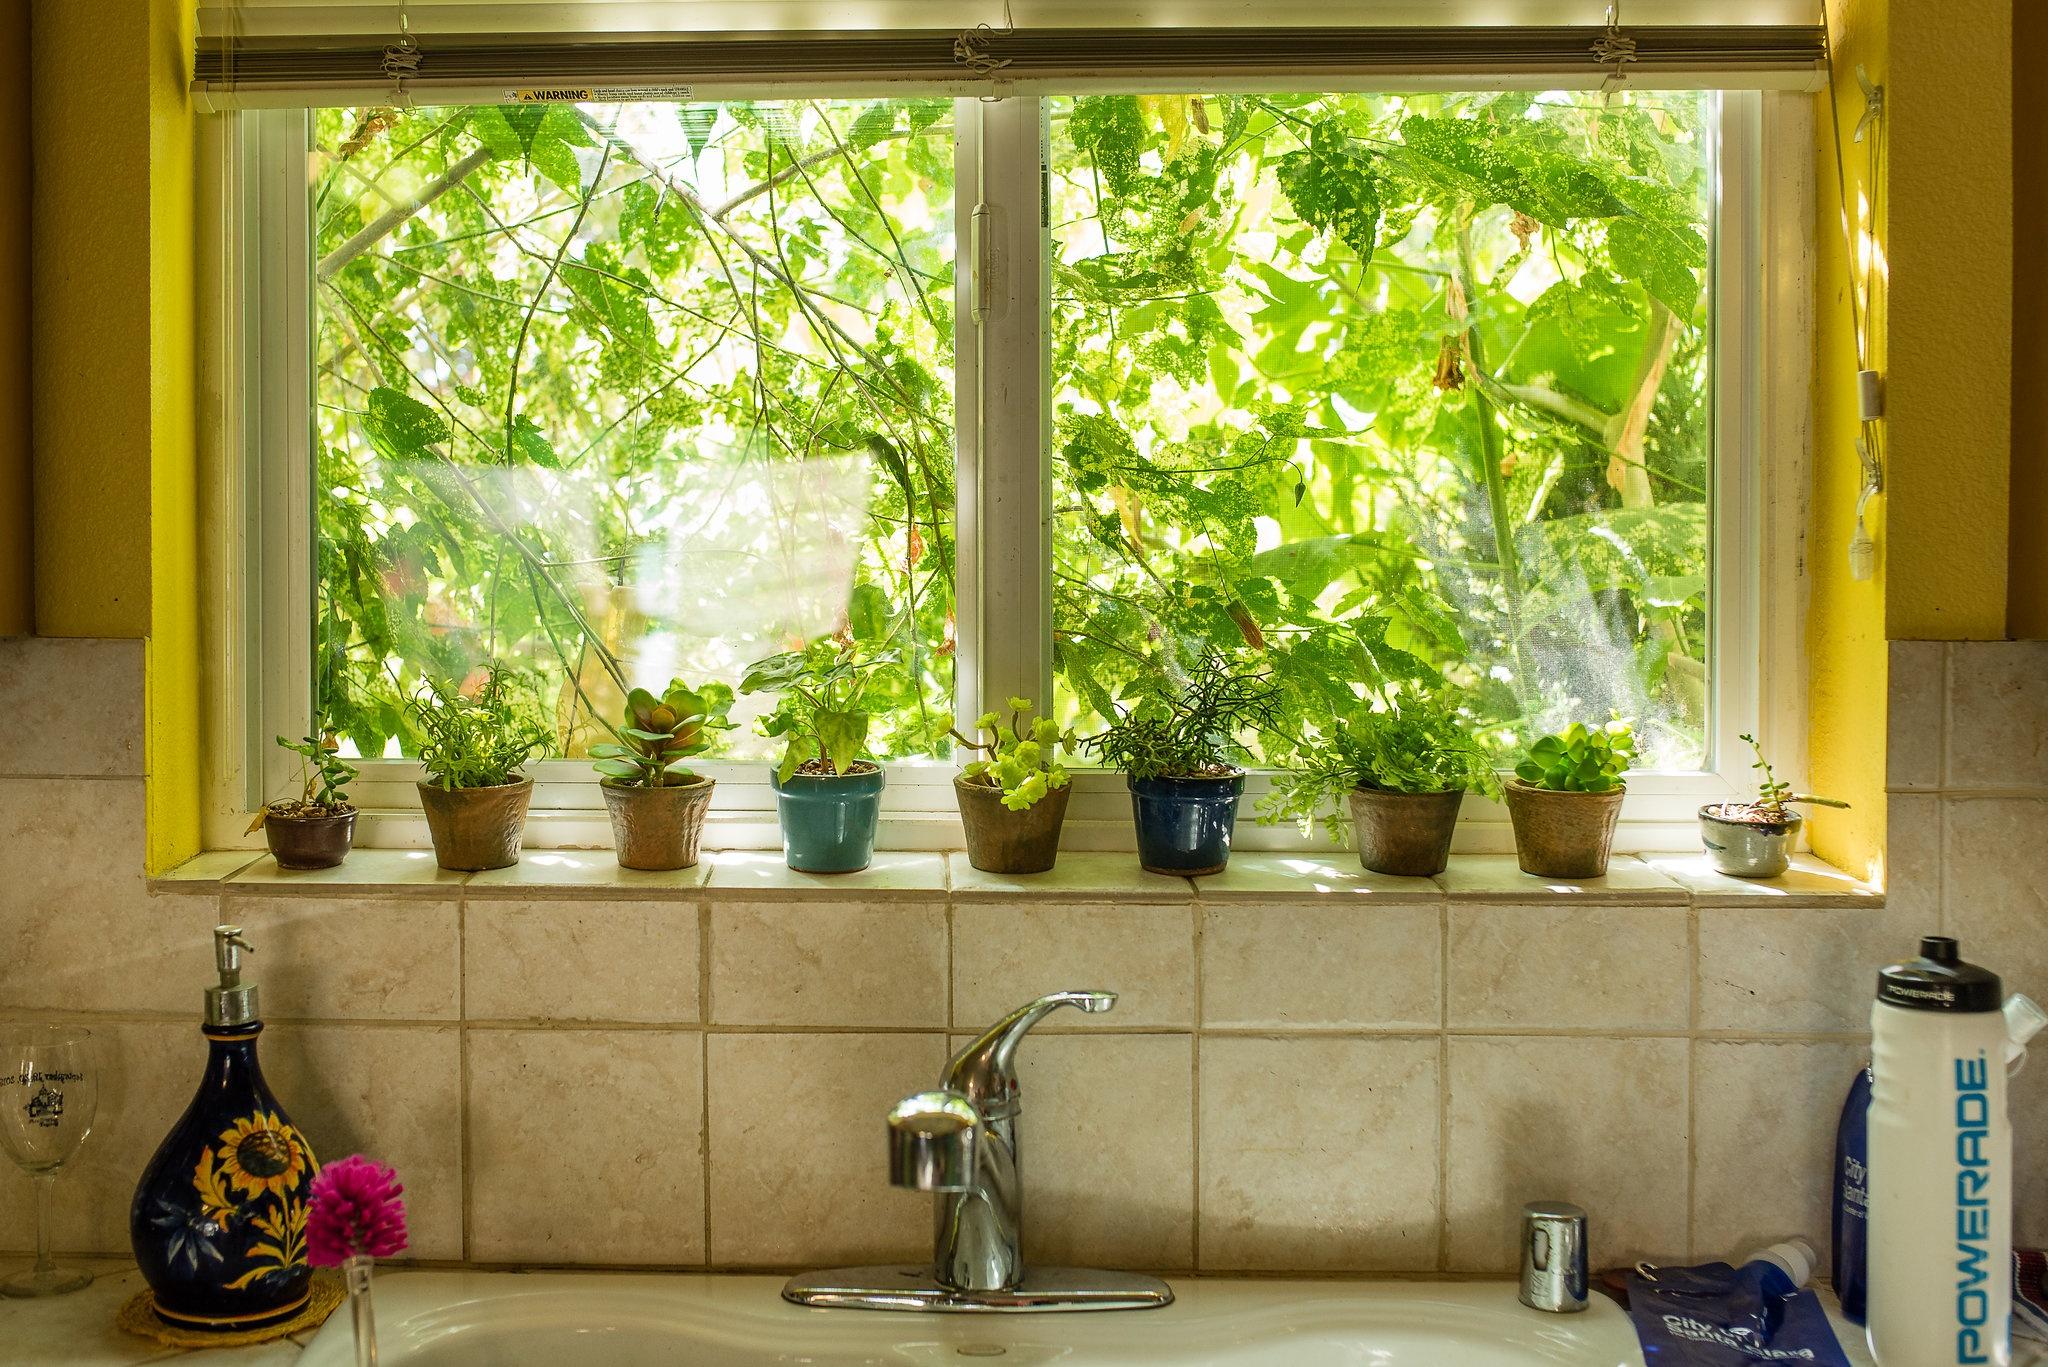 Homeownership brings health